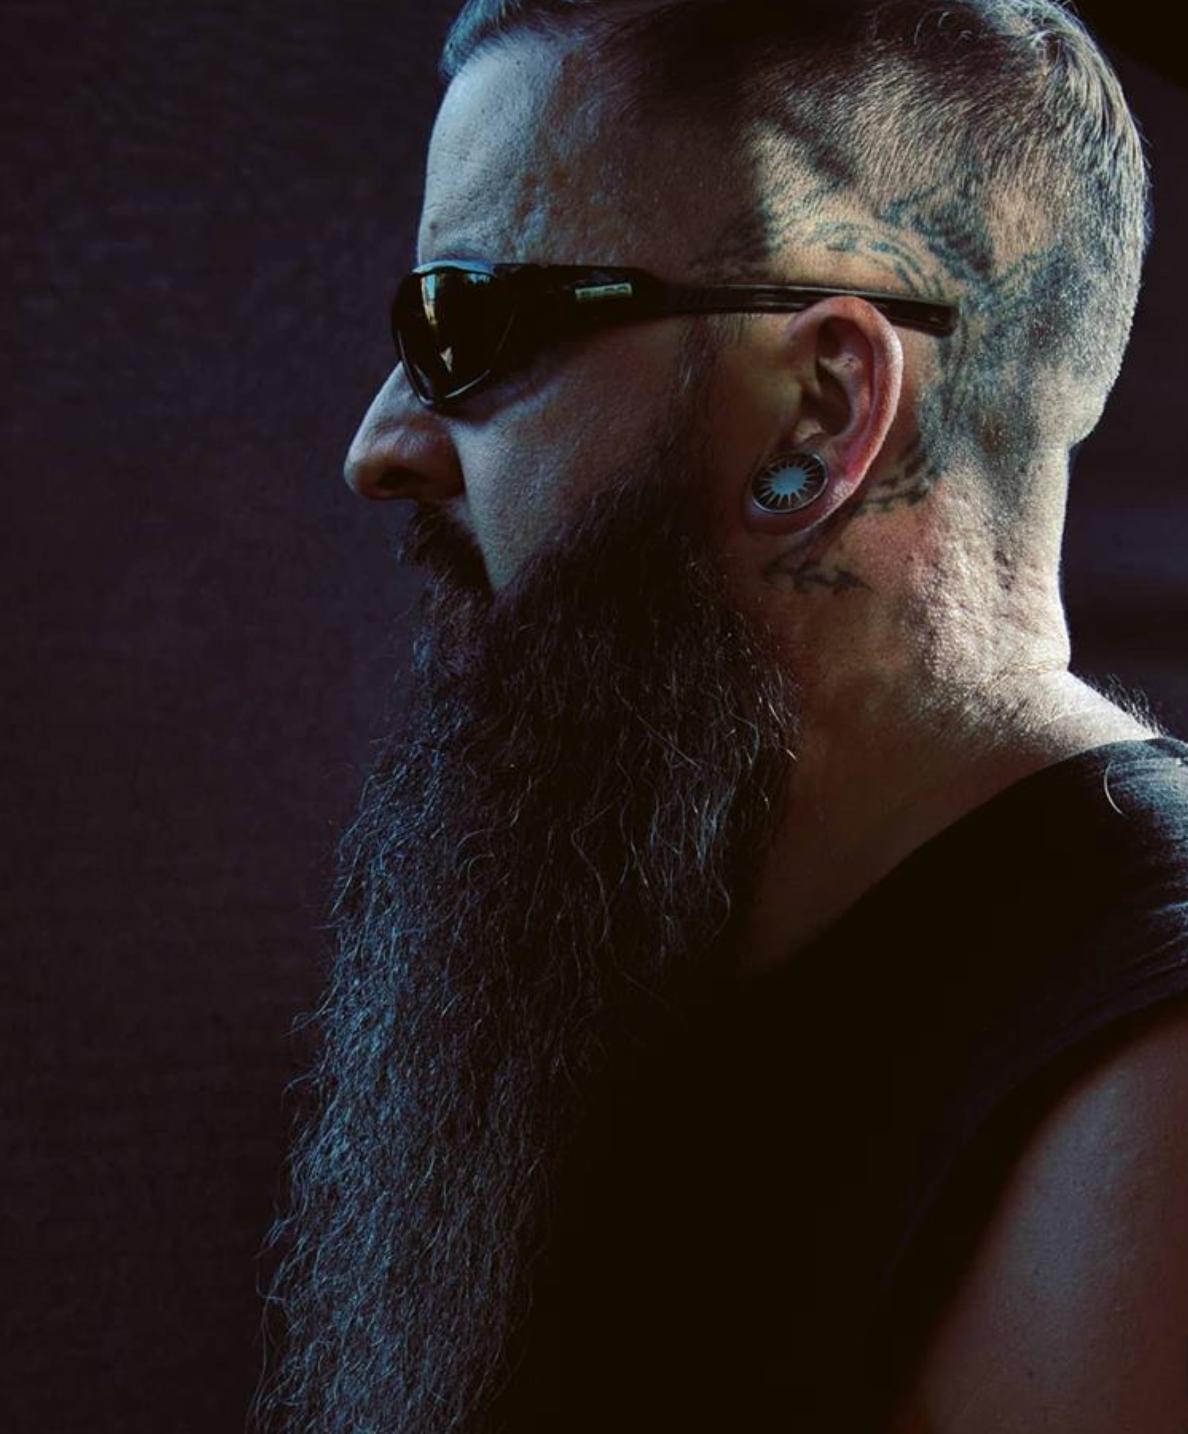 Beard Man with Shades Beard grooming, Beard look, Best